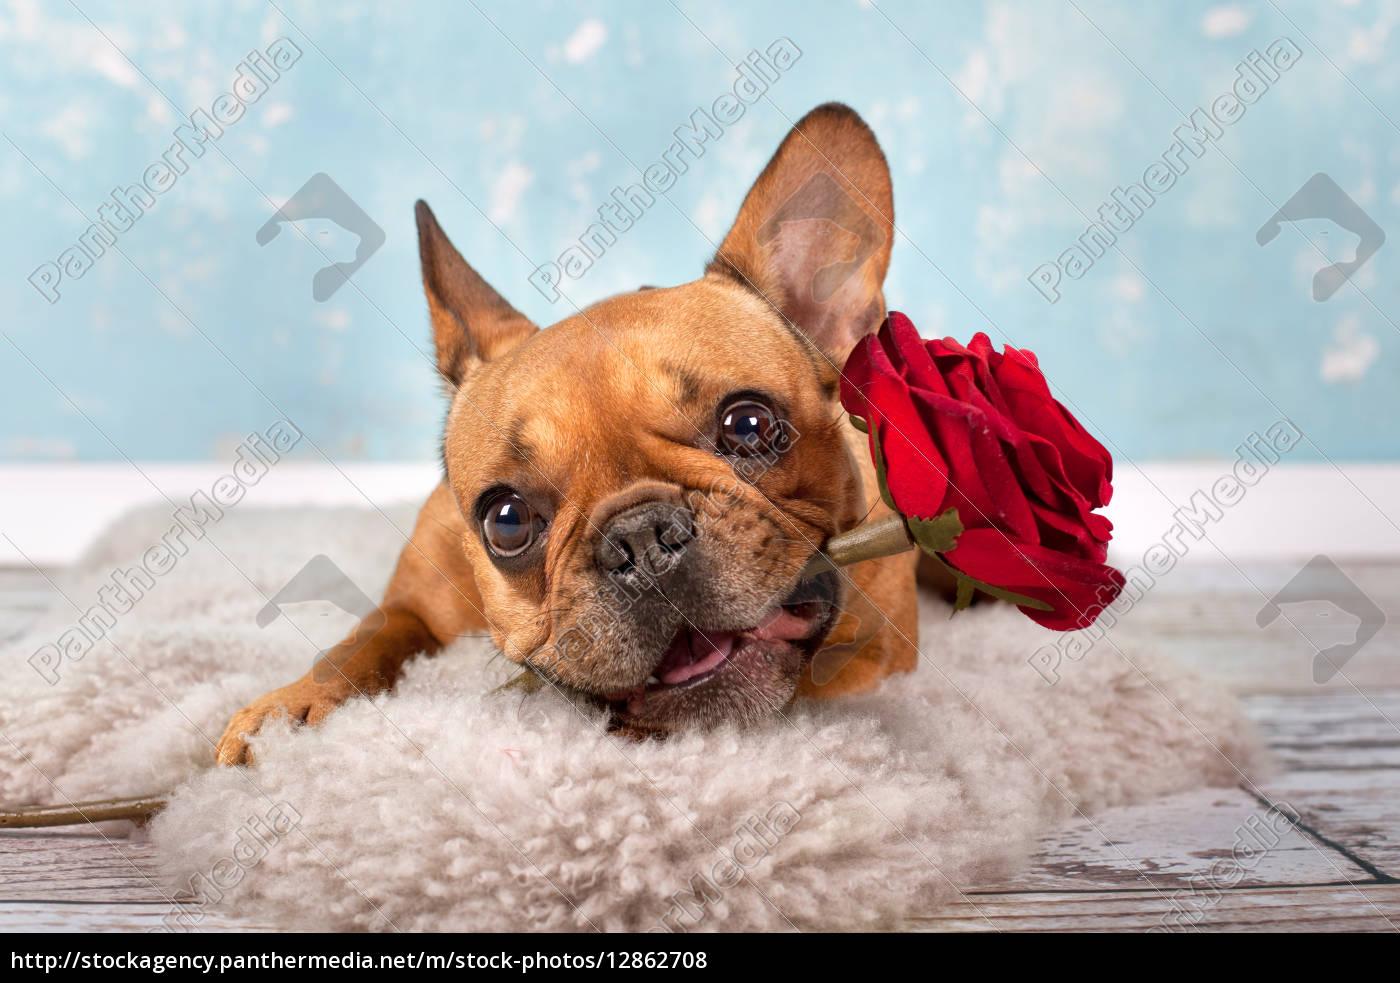 franz sische bulldogge mit rose lizenzfreies foto 12862708 bildagentur panthermedia. Black Bedroom Furniture Sets. Home Design Ideas